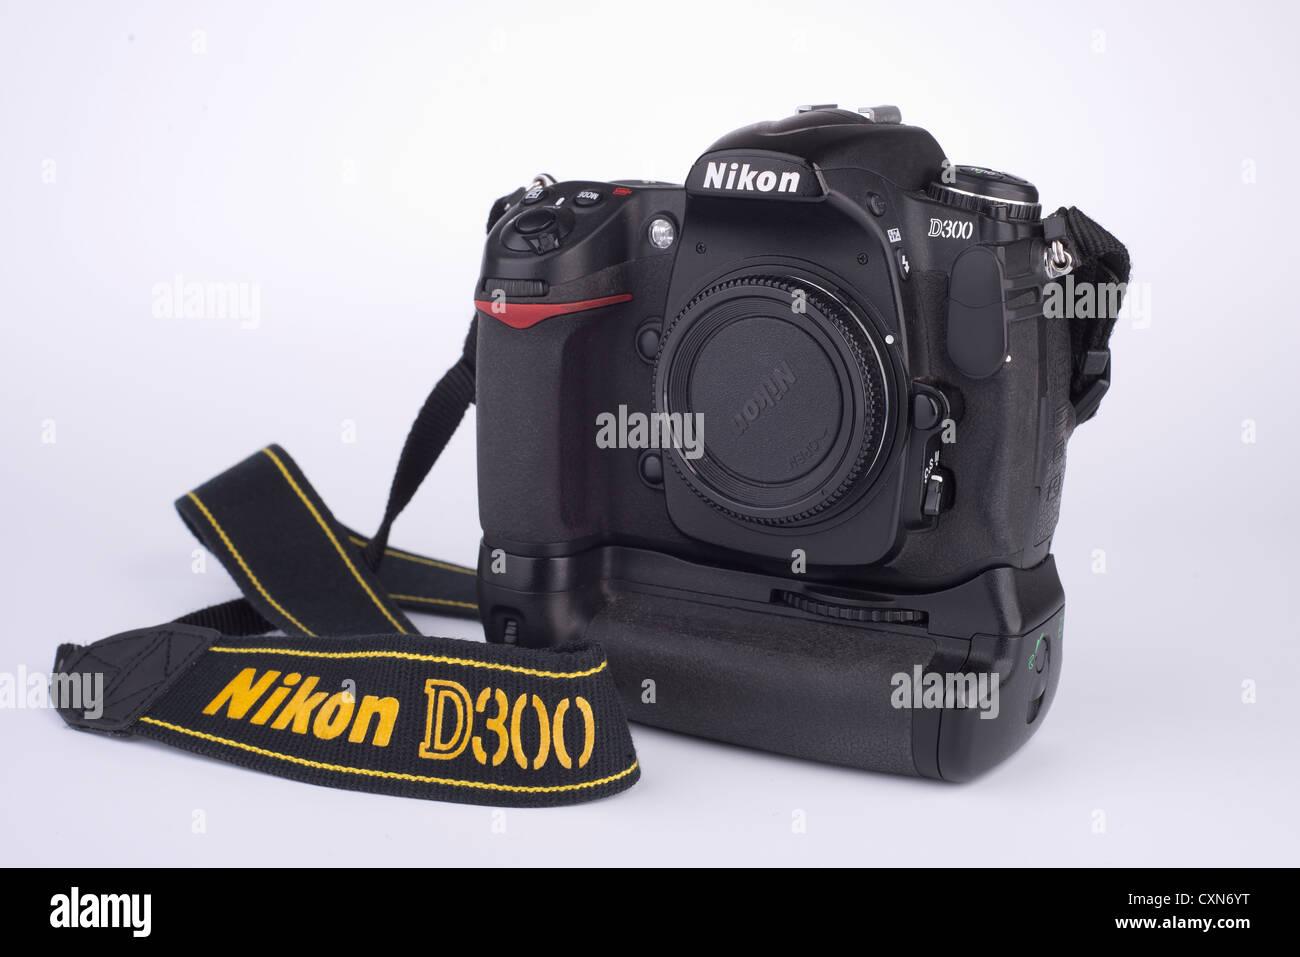 D300 Nikon Camera - Stock Image